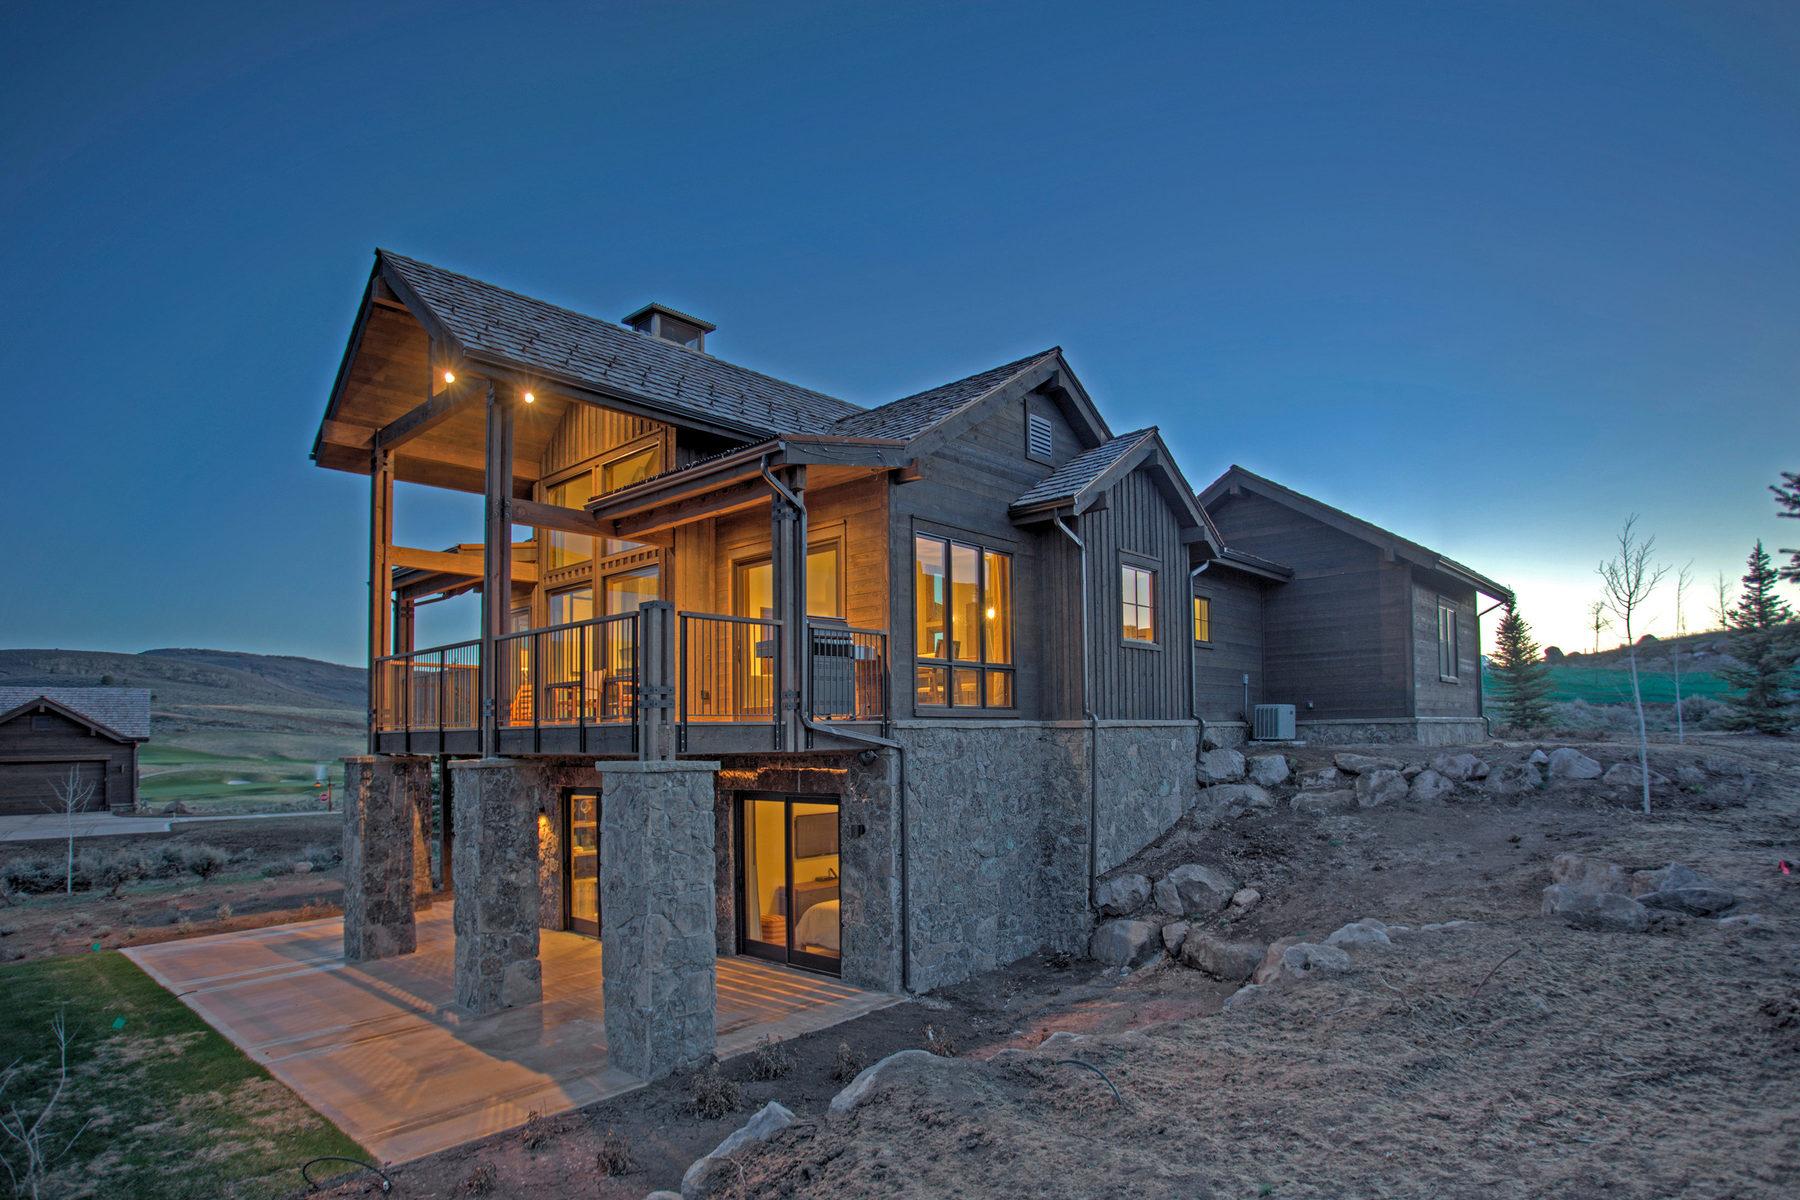 Moradia para Venda às Juniper Cabin with Spectacular Views 6737 E Riparian Way Lot #138 Heber City, Utah 84032 Estados Unidos